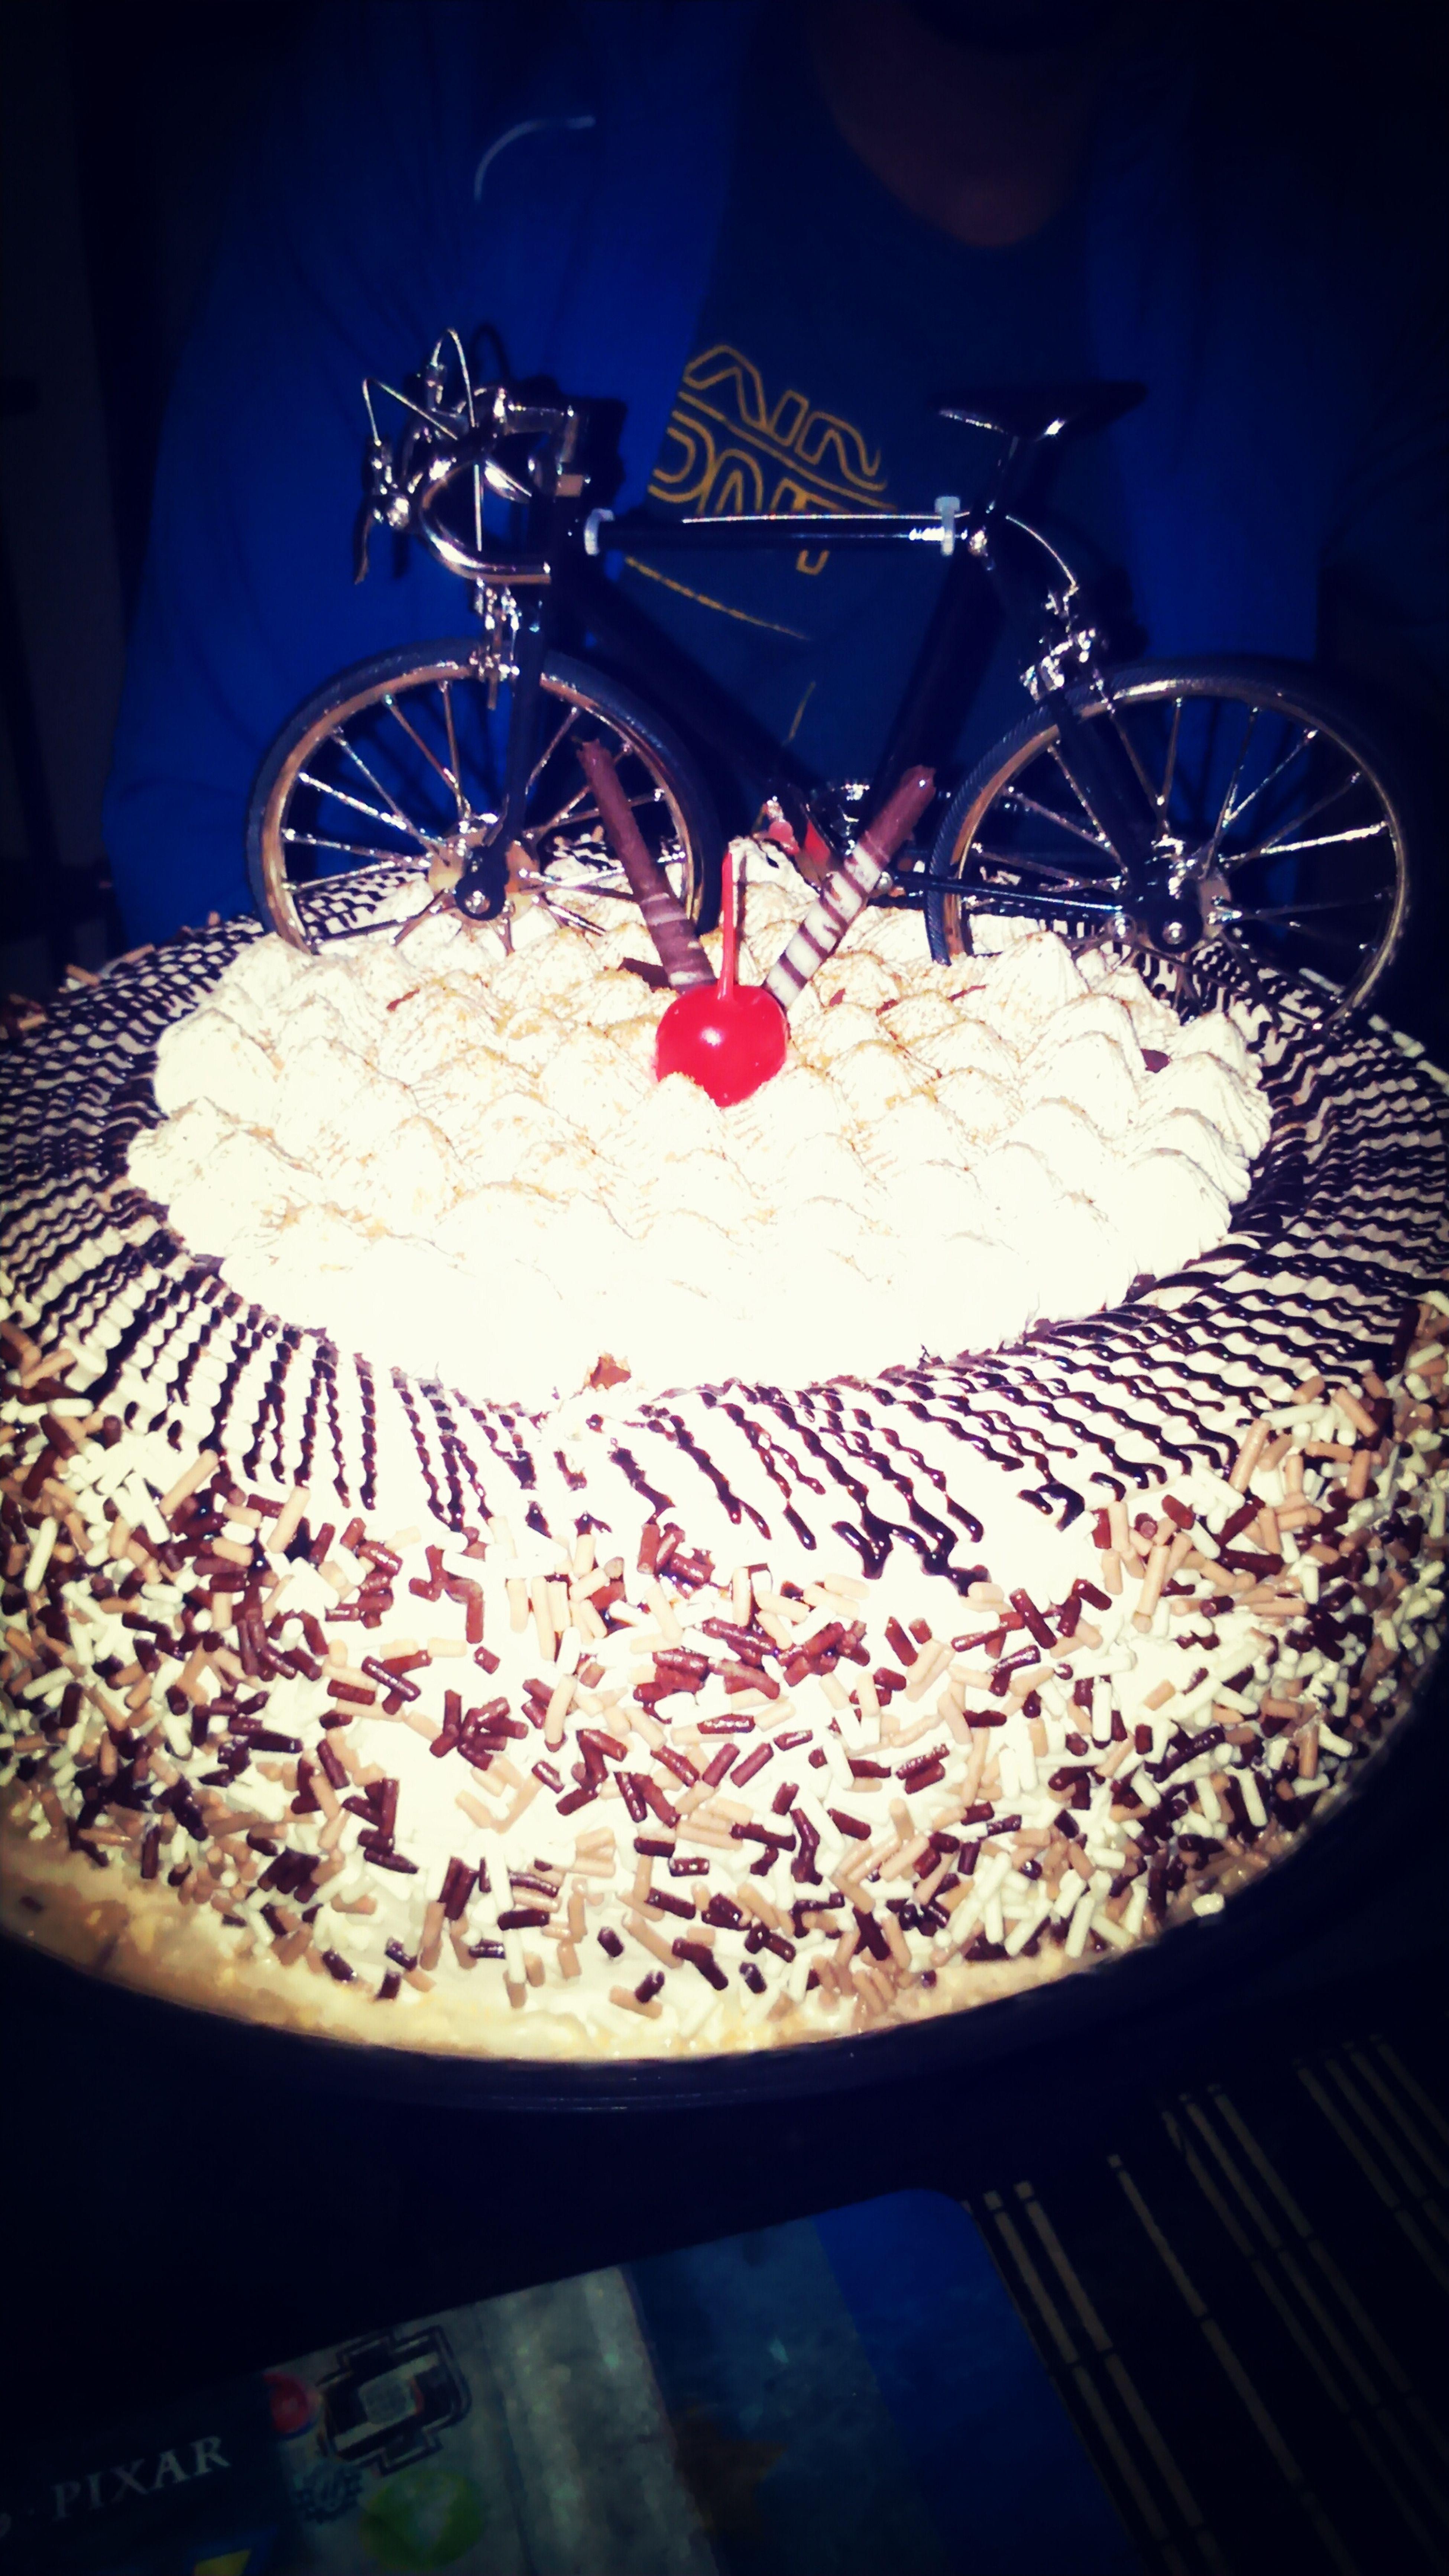 Felizcumpleaños Jorge George QueremosPastel